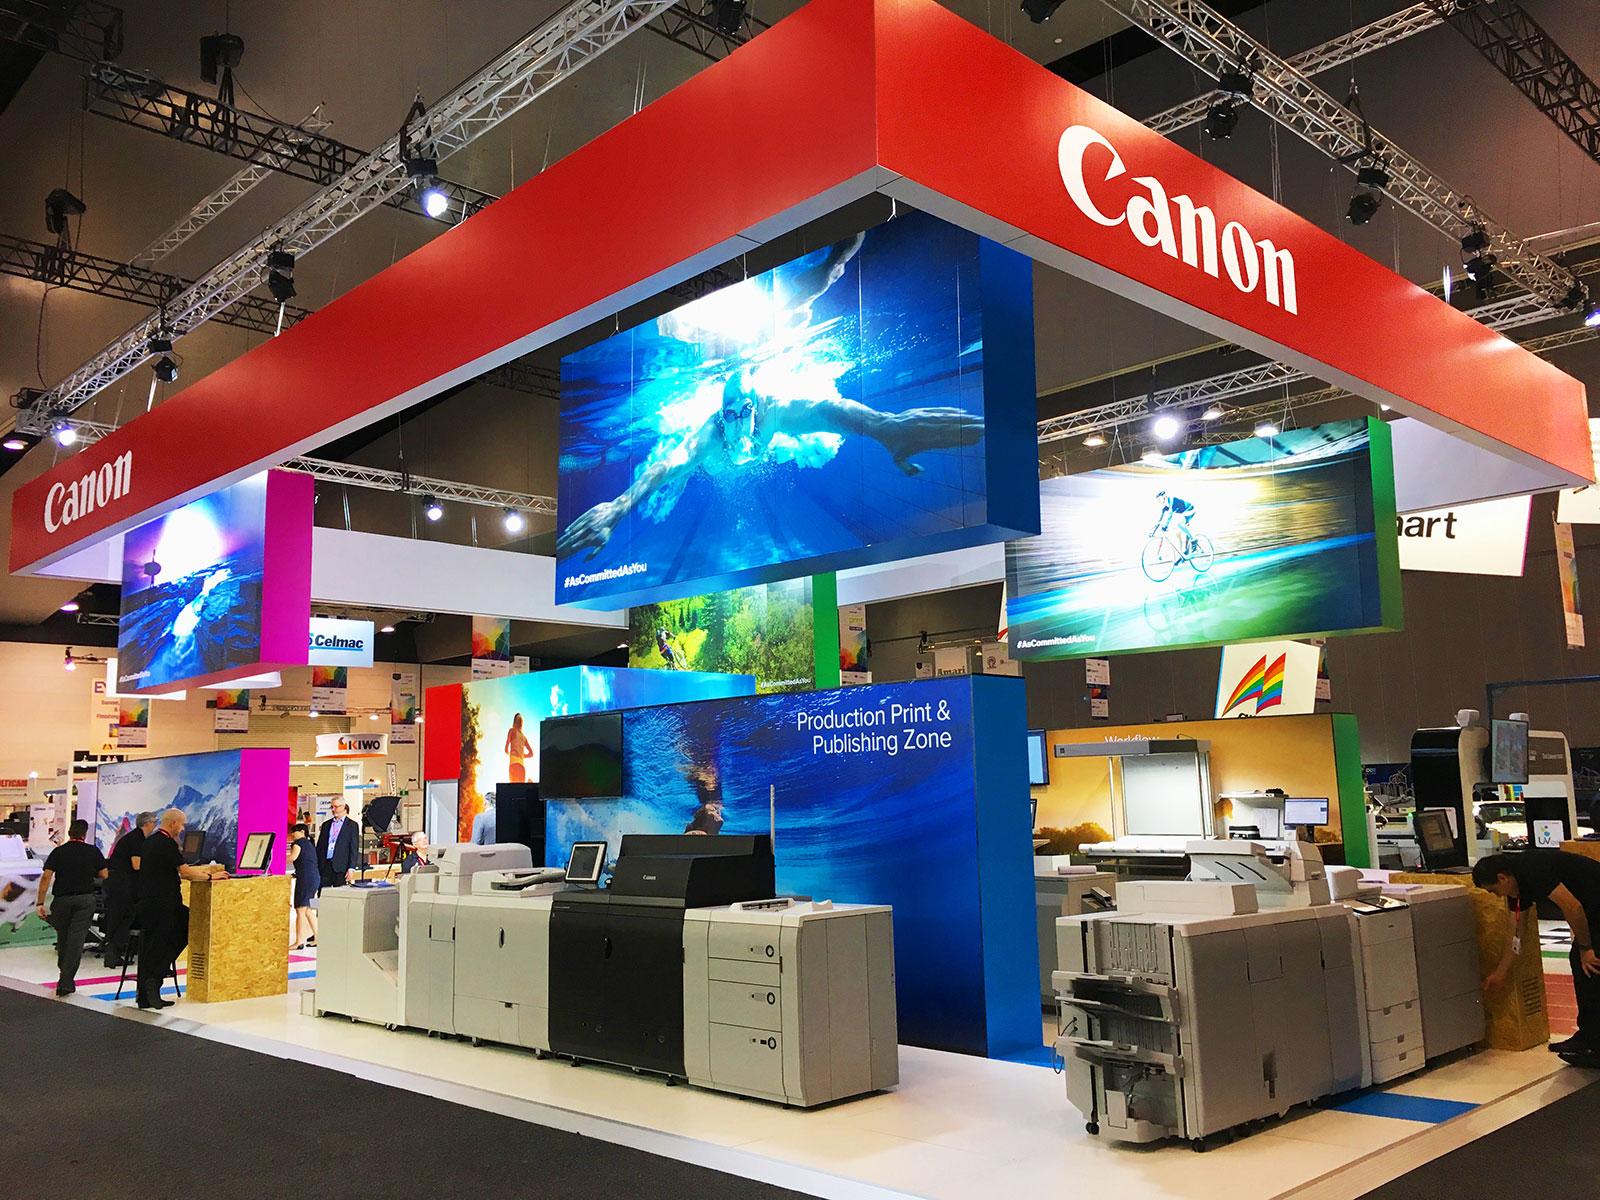 Canon01